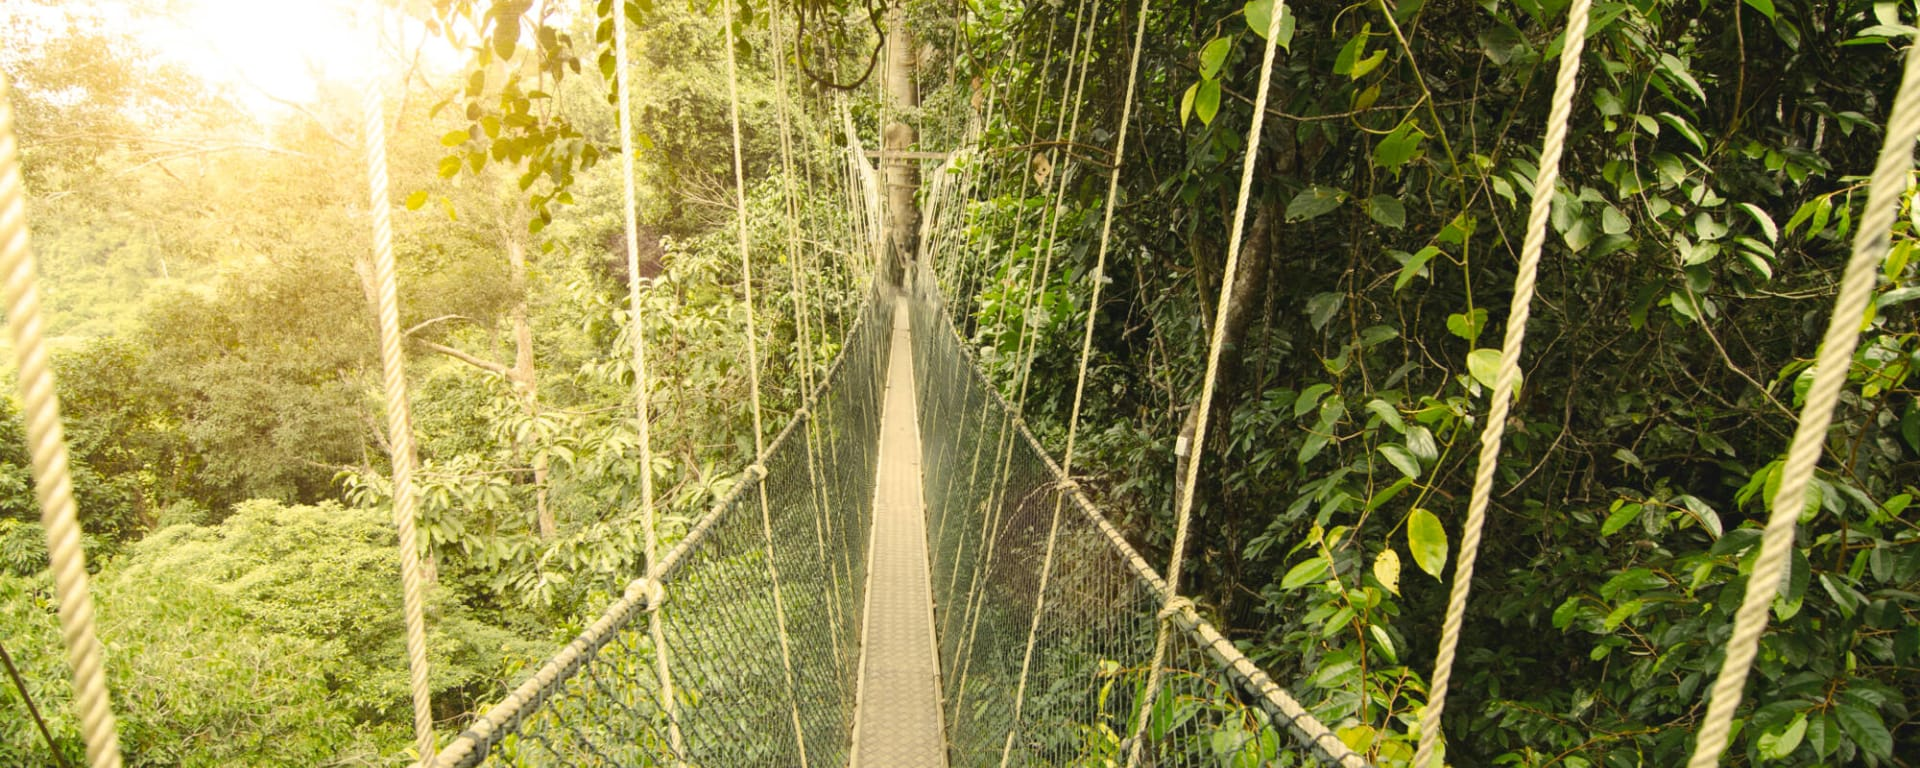 Malaysia entdecken mit Tischler Reisen: Malaysia Taman Negara Canopy Walk